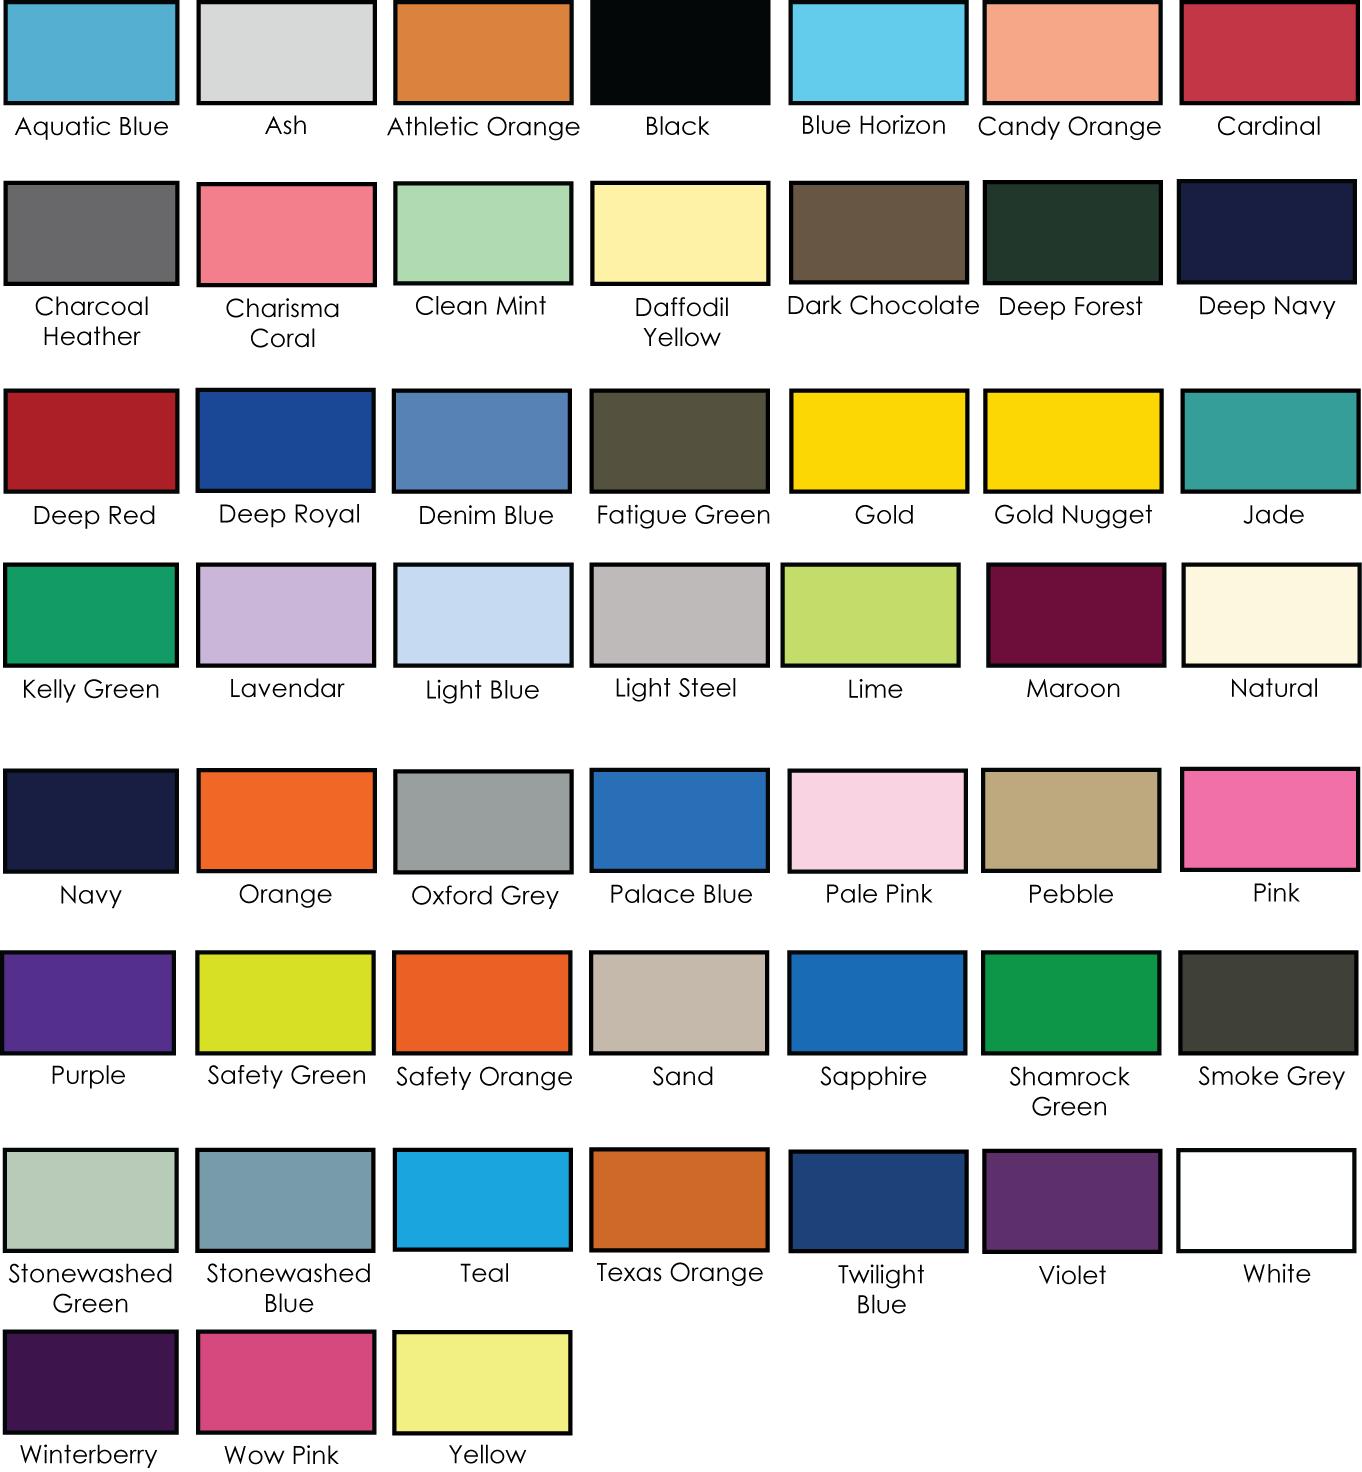 Hanes 5250 61oz tagless tee adver t screen printing color chart 5250imagecolor nvjuhfo Image collections